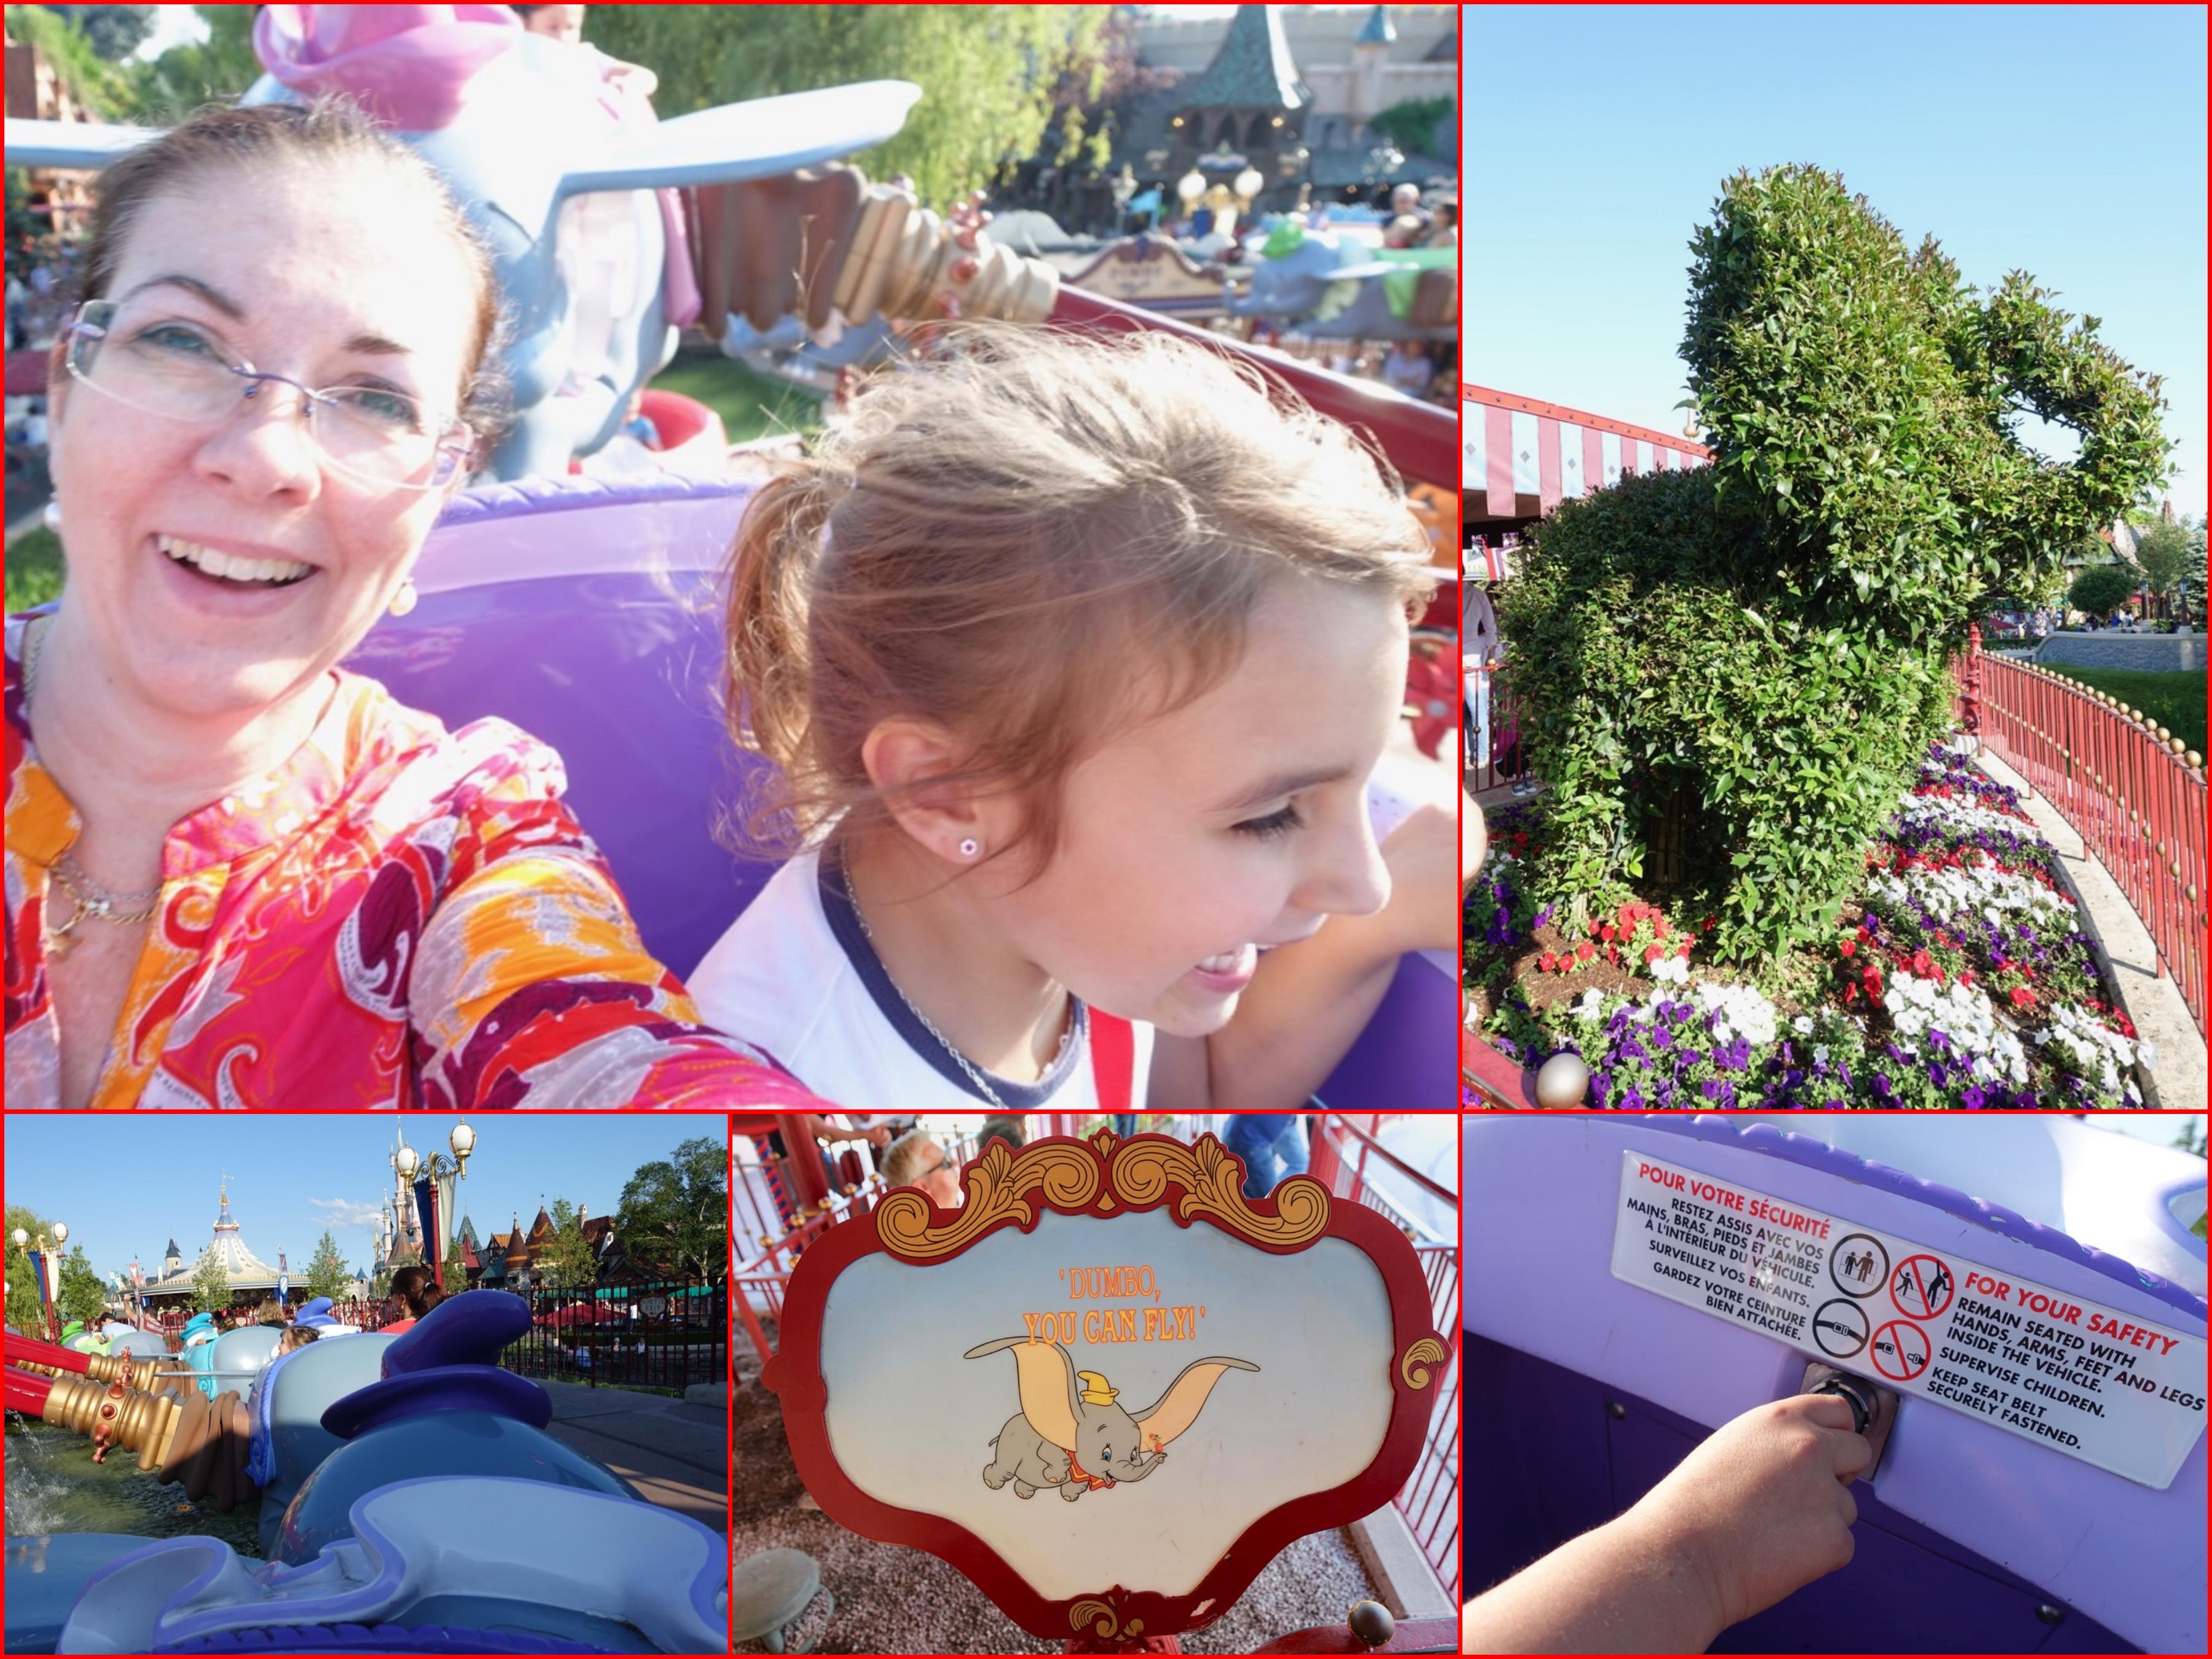 Disneyland-Besuch-HappyFace313